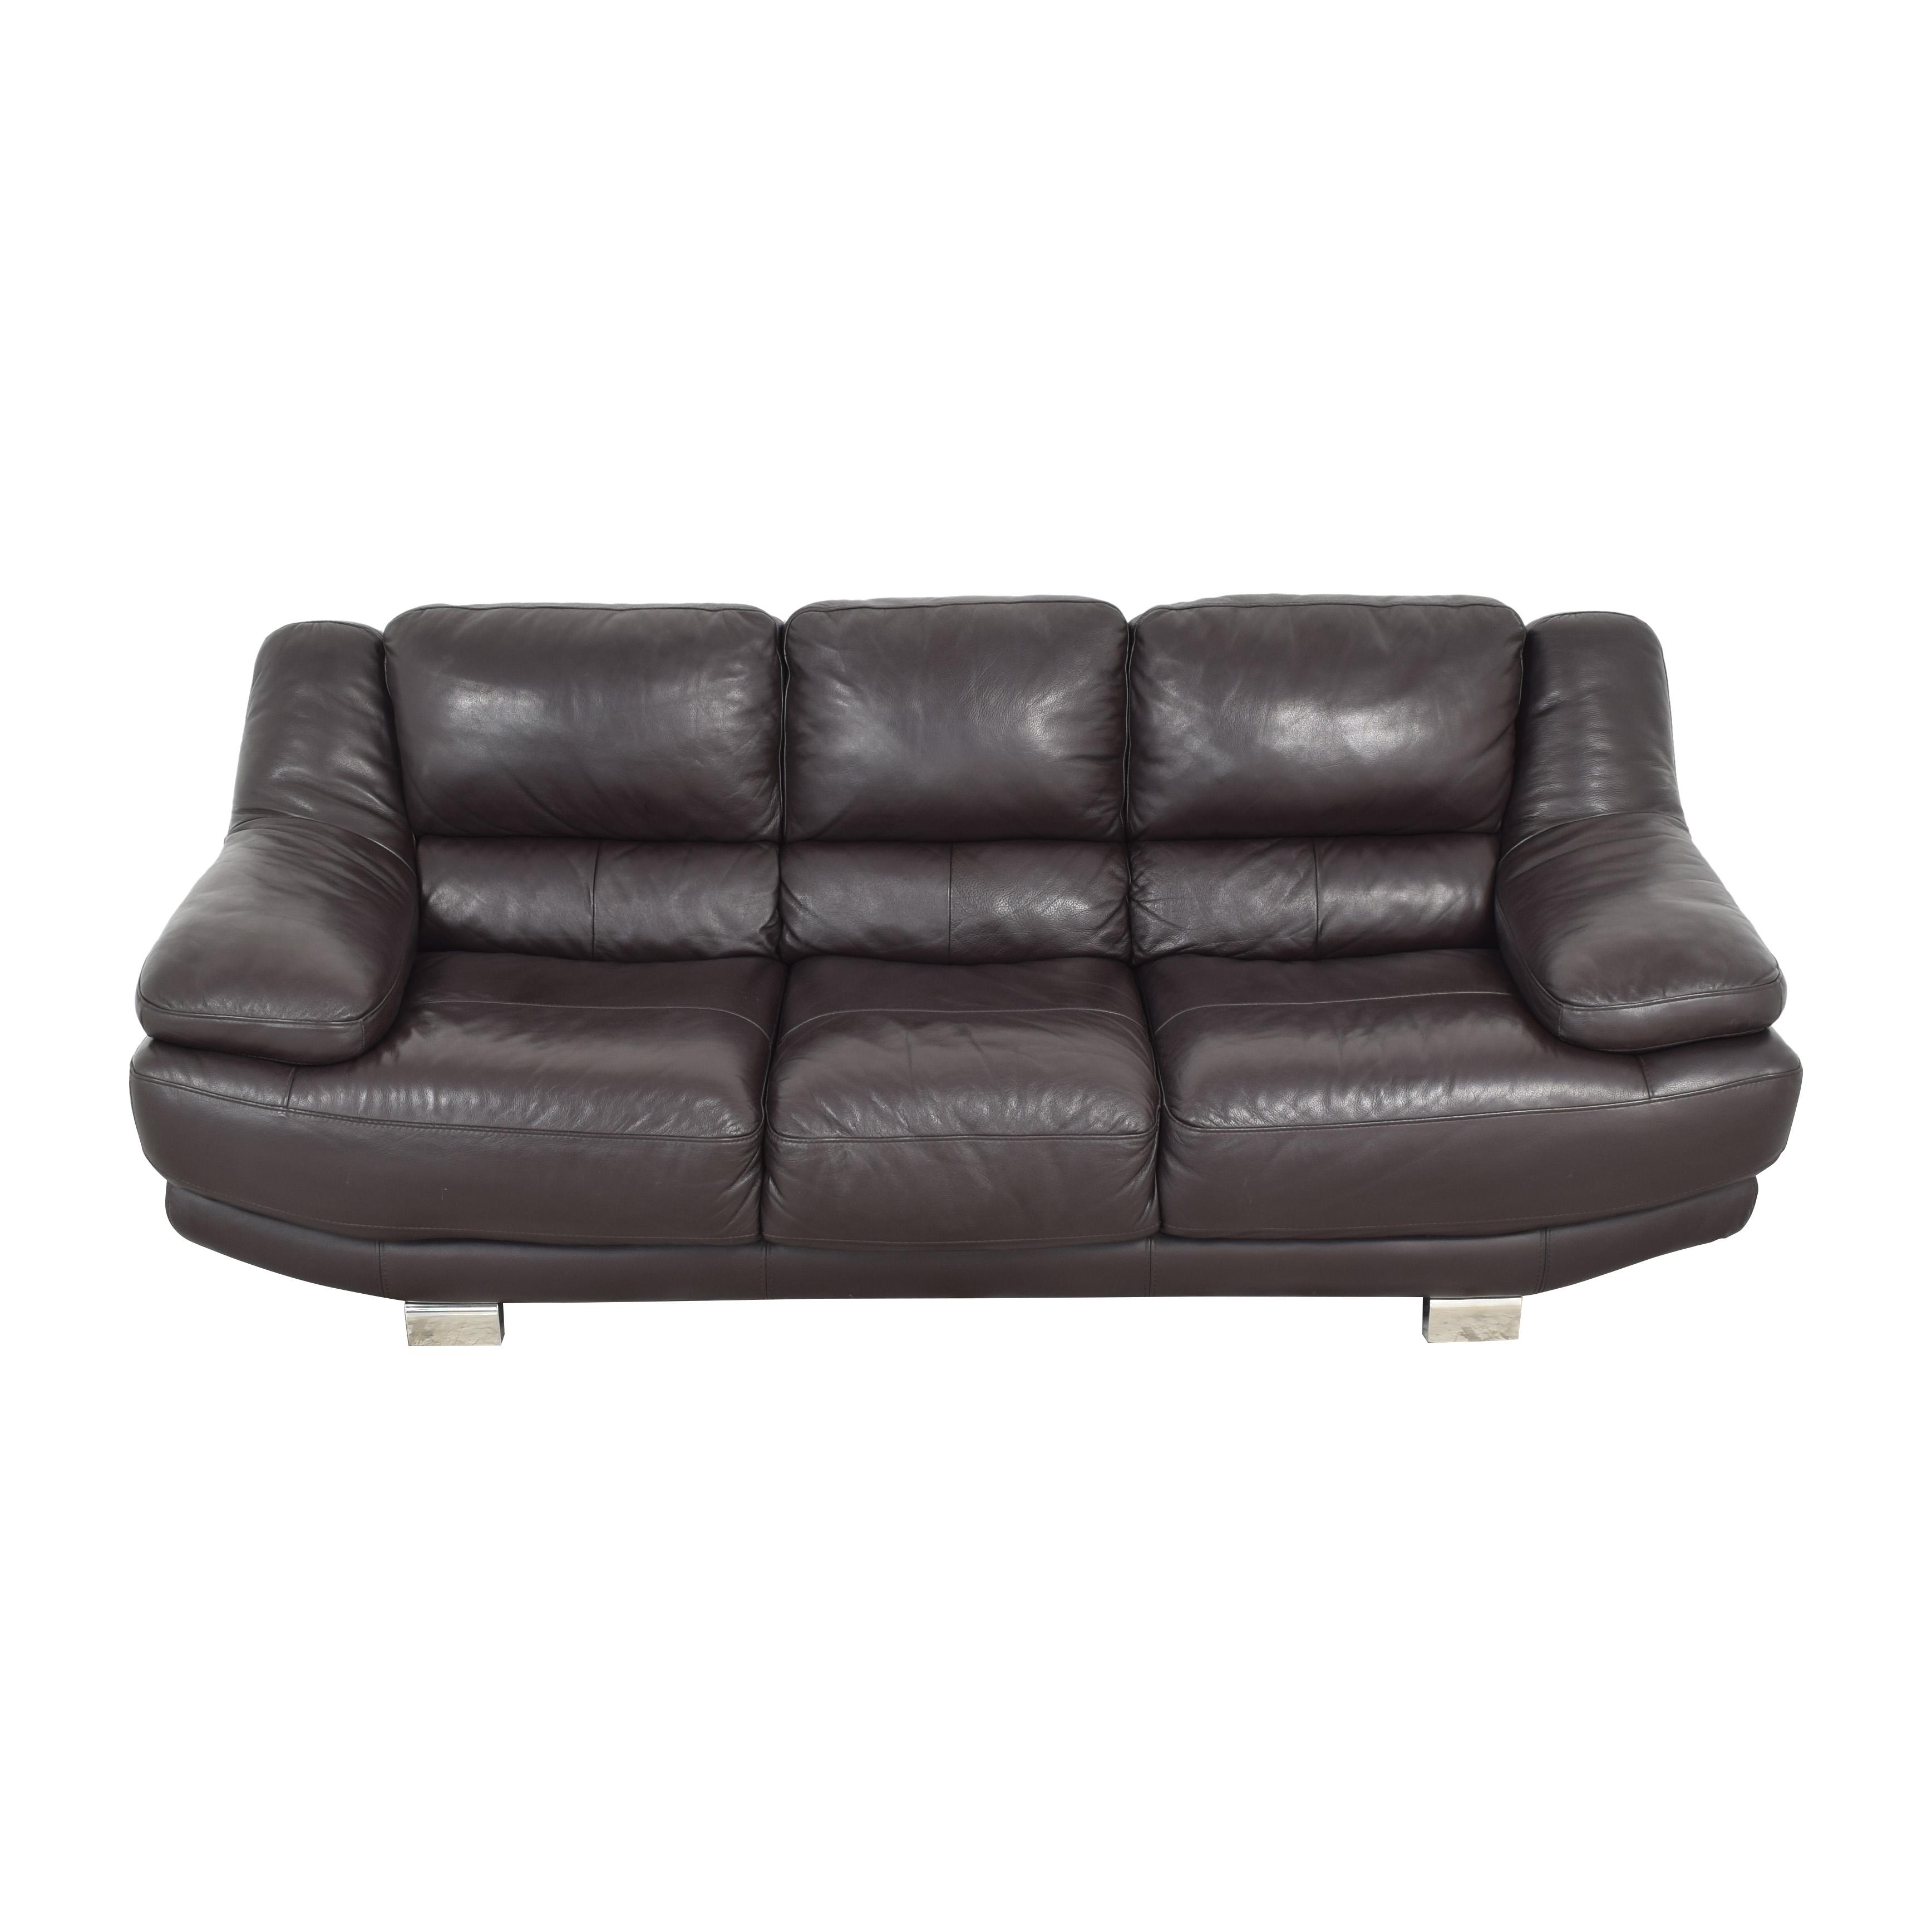 Raymour & Flanigan Raymour & Flanigan Three Seat Sofa discount